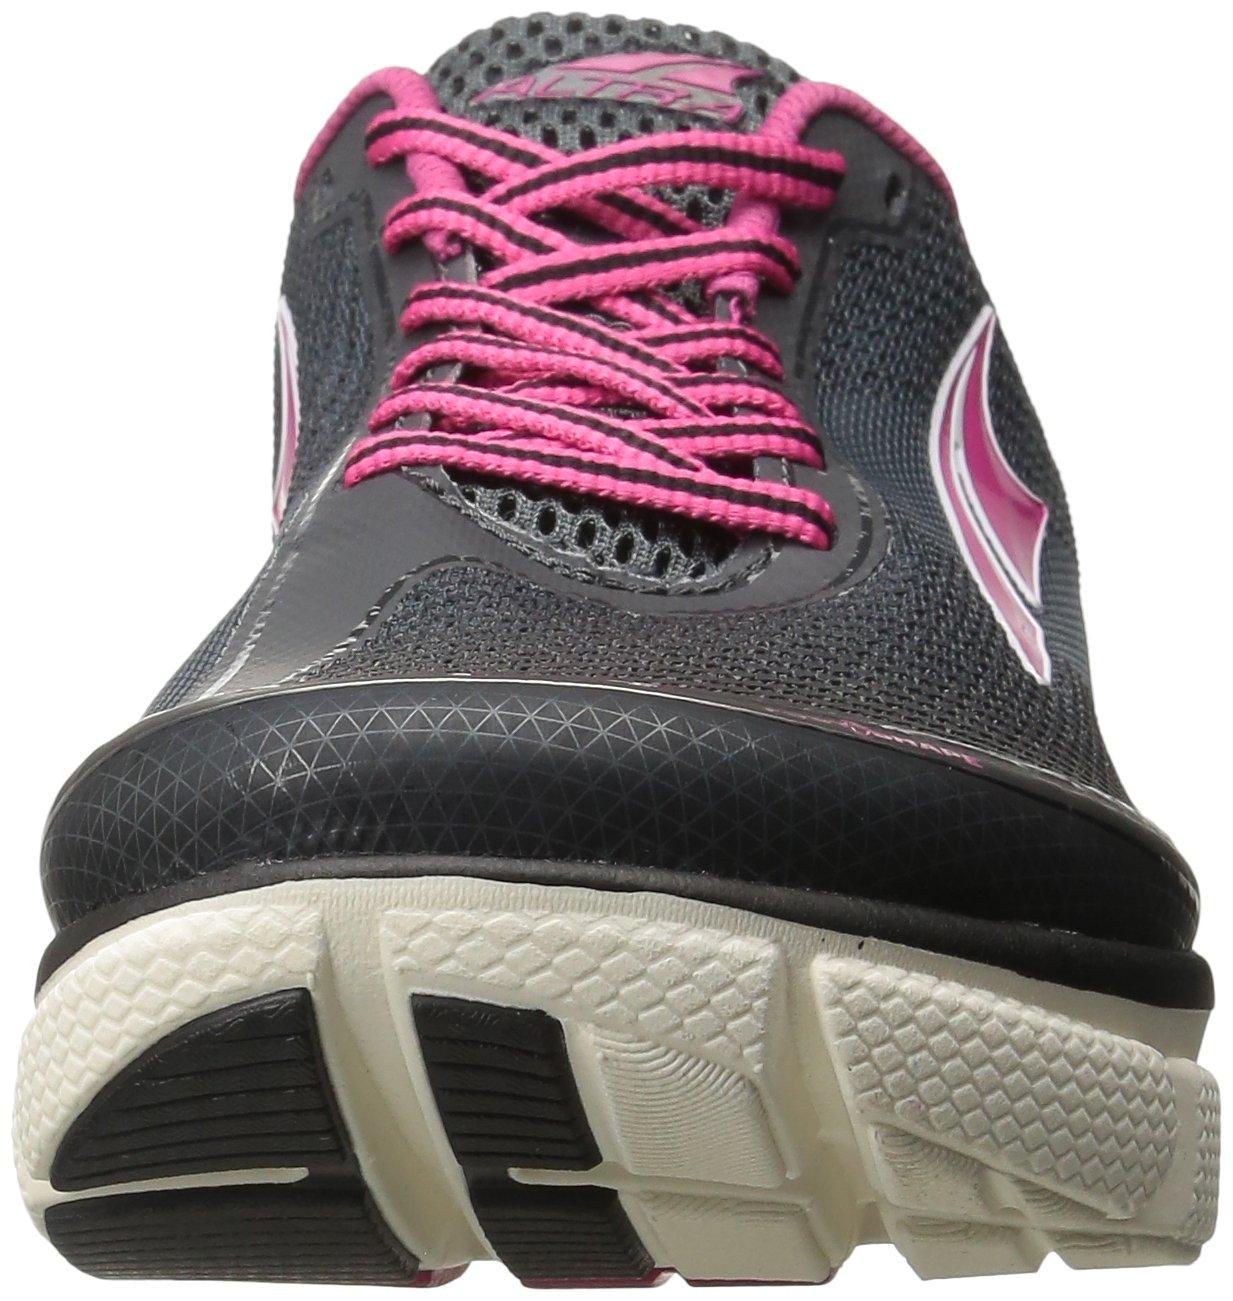 Altra Women's Torin 2.5 Trail Runner B01B72L4QS 7.5 B(M) US Gray/Raspberry